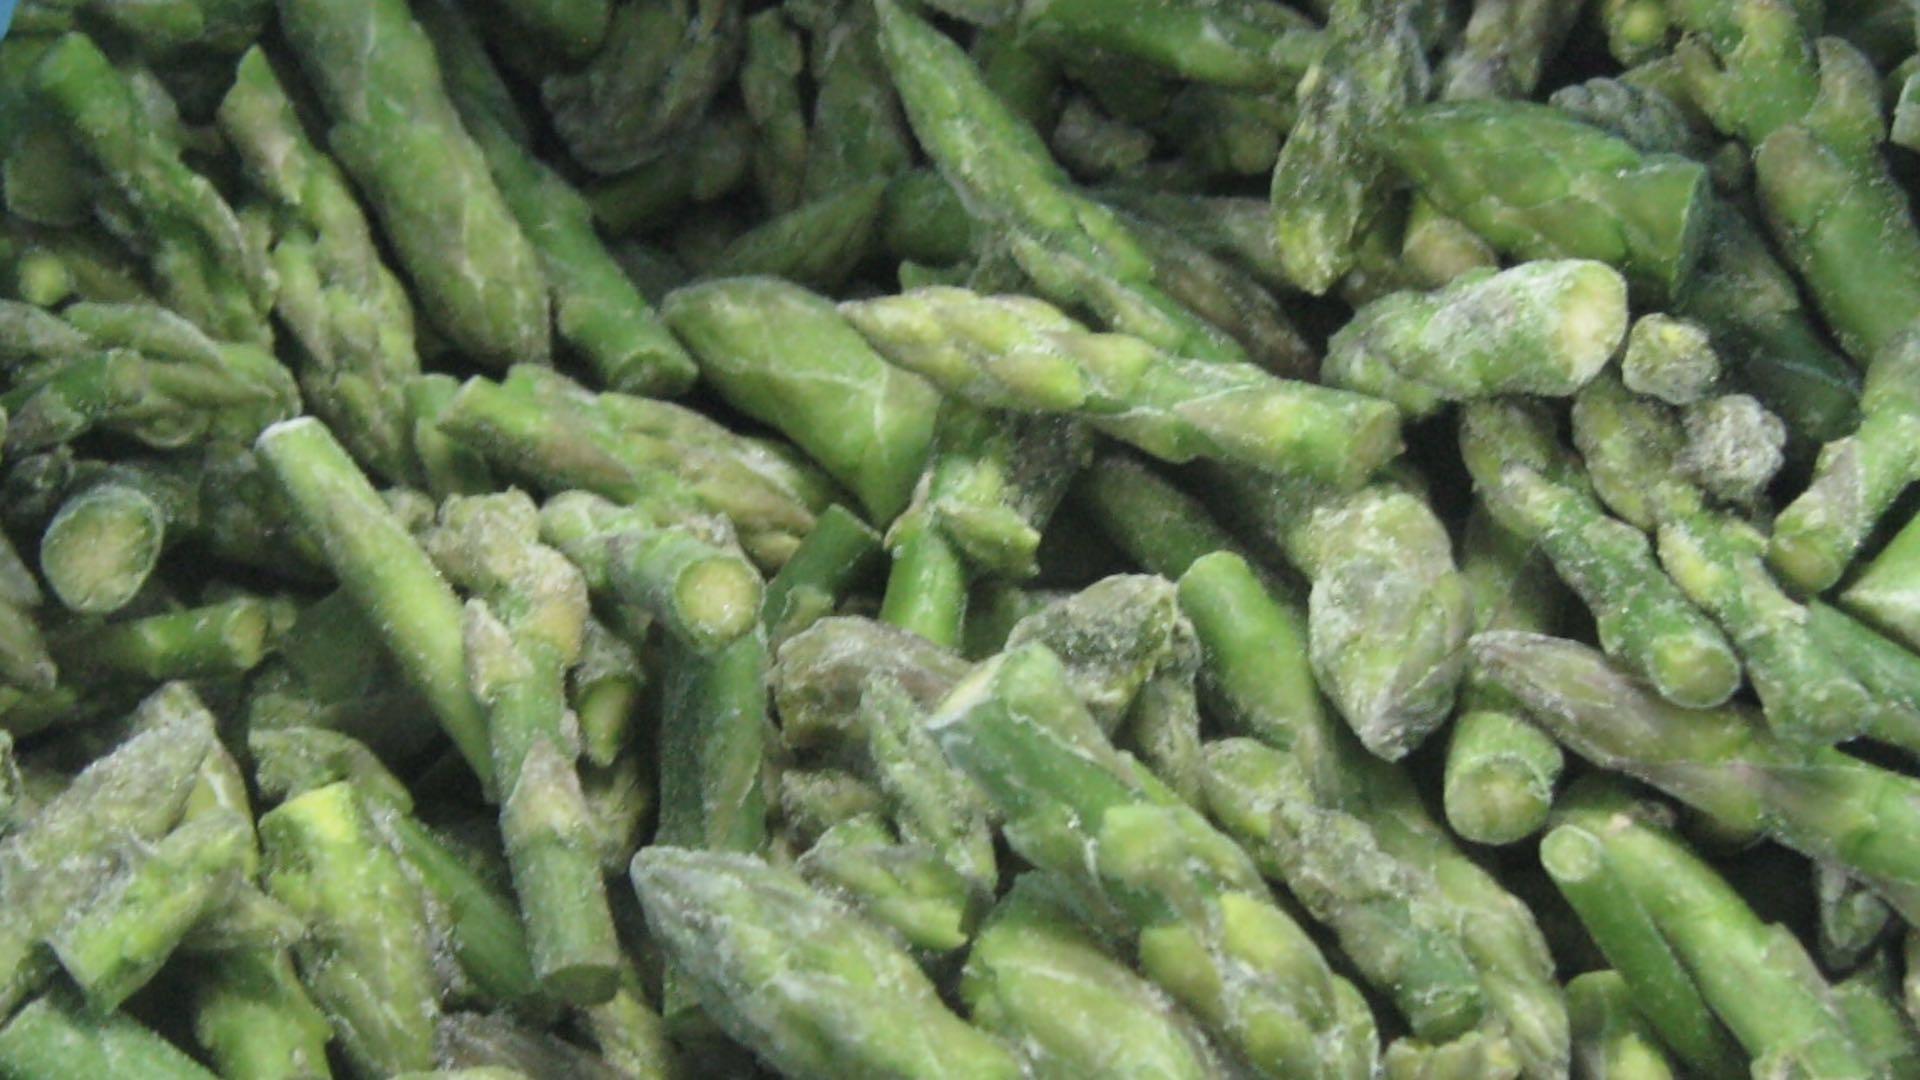 IQF Green Asparagus Cuts & Tips,Frozen Green Asparagus Tips & Cuts 2